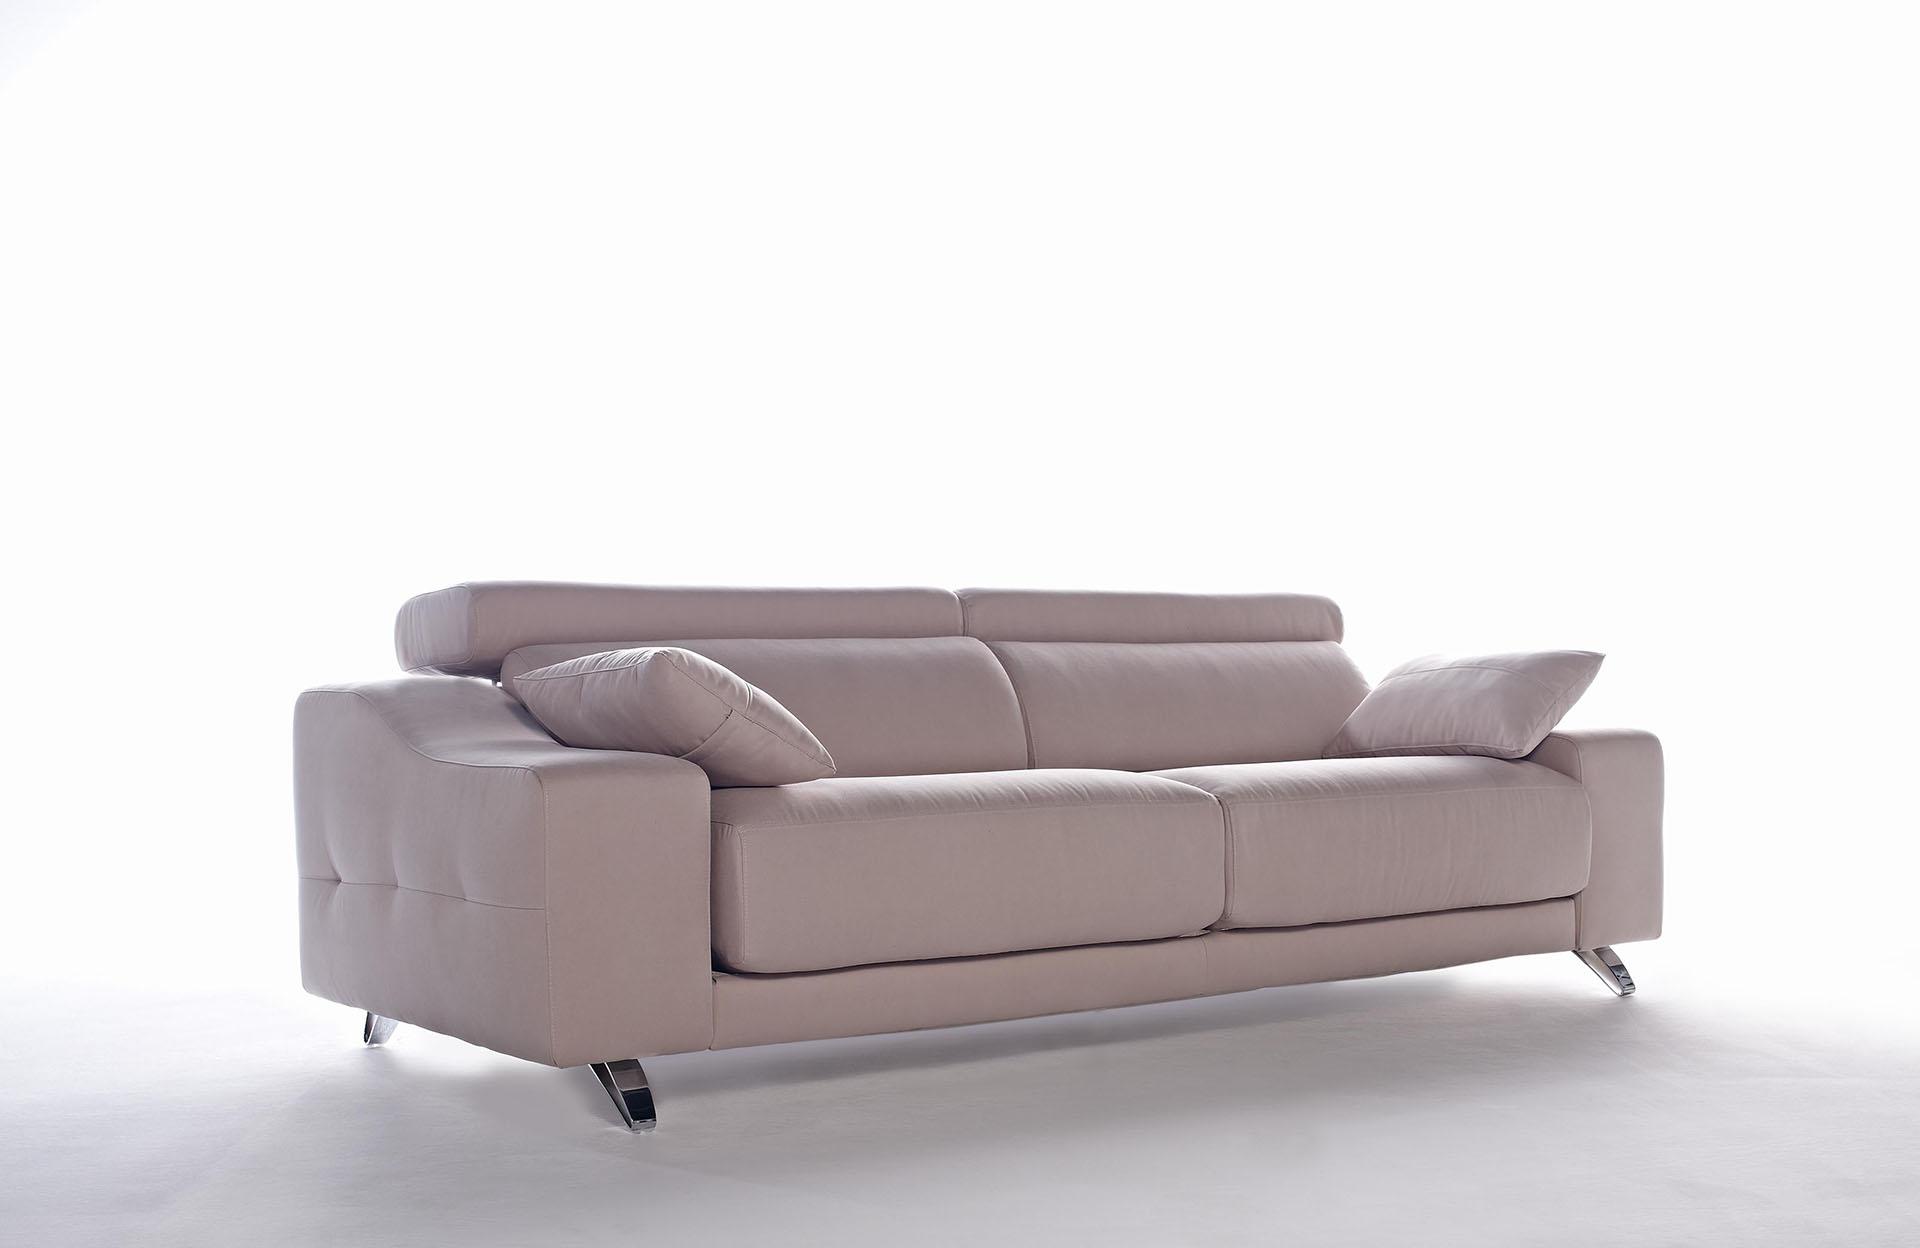 habitat chester sofa leather microfiber cover garnet natural sofas sofs y butacas arhabitat sillones de 3